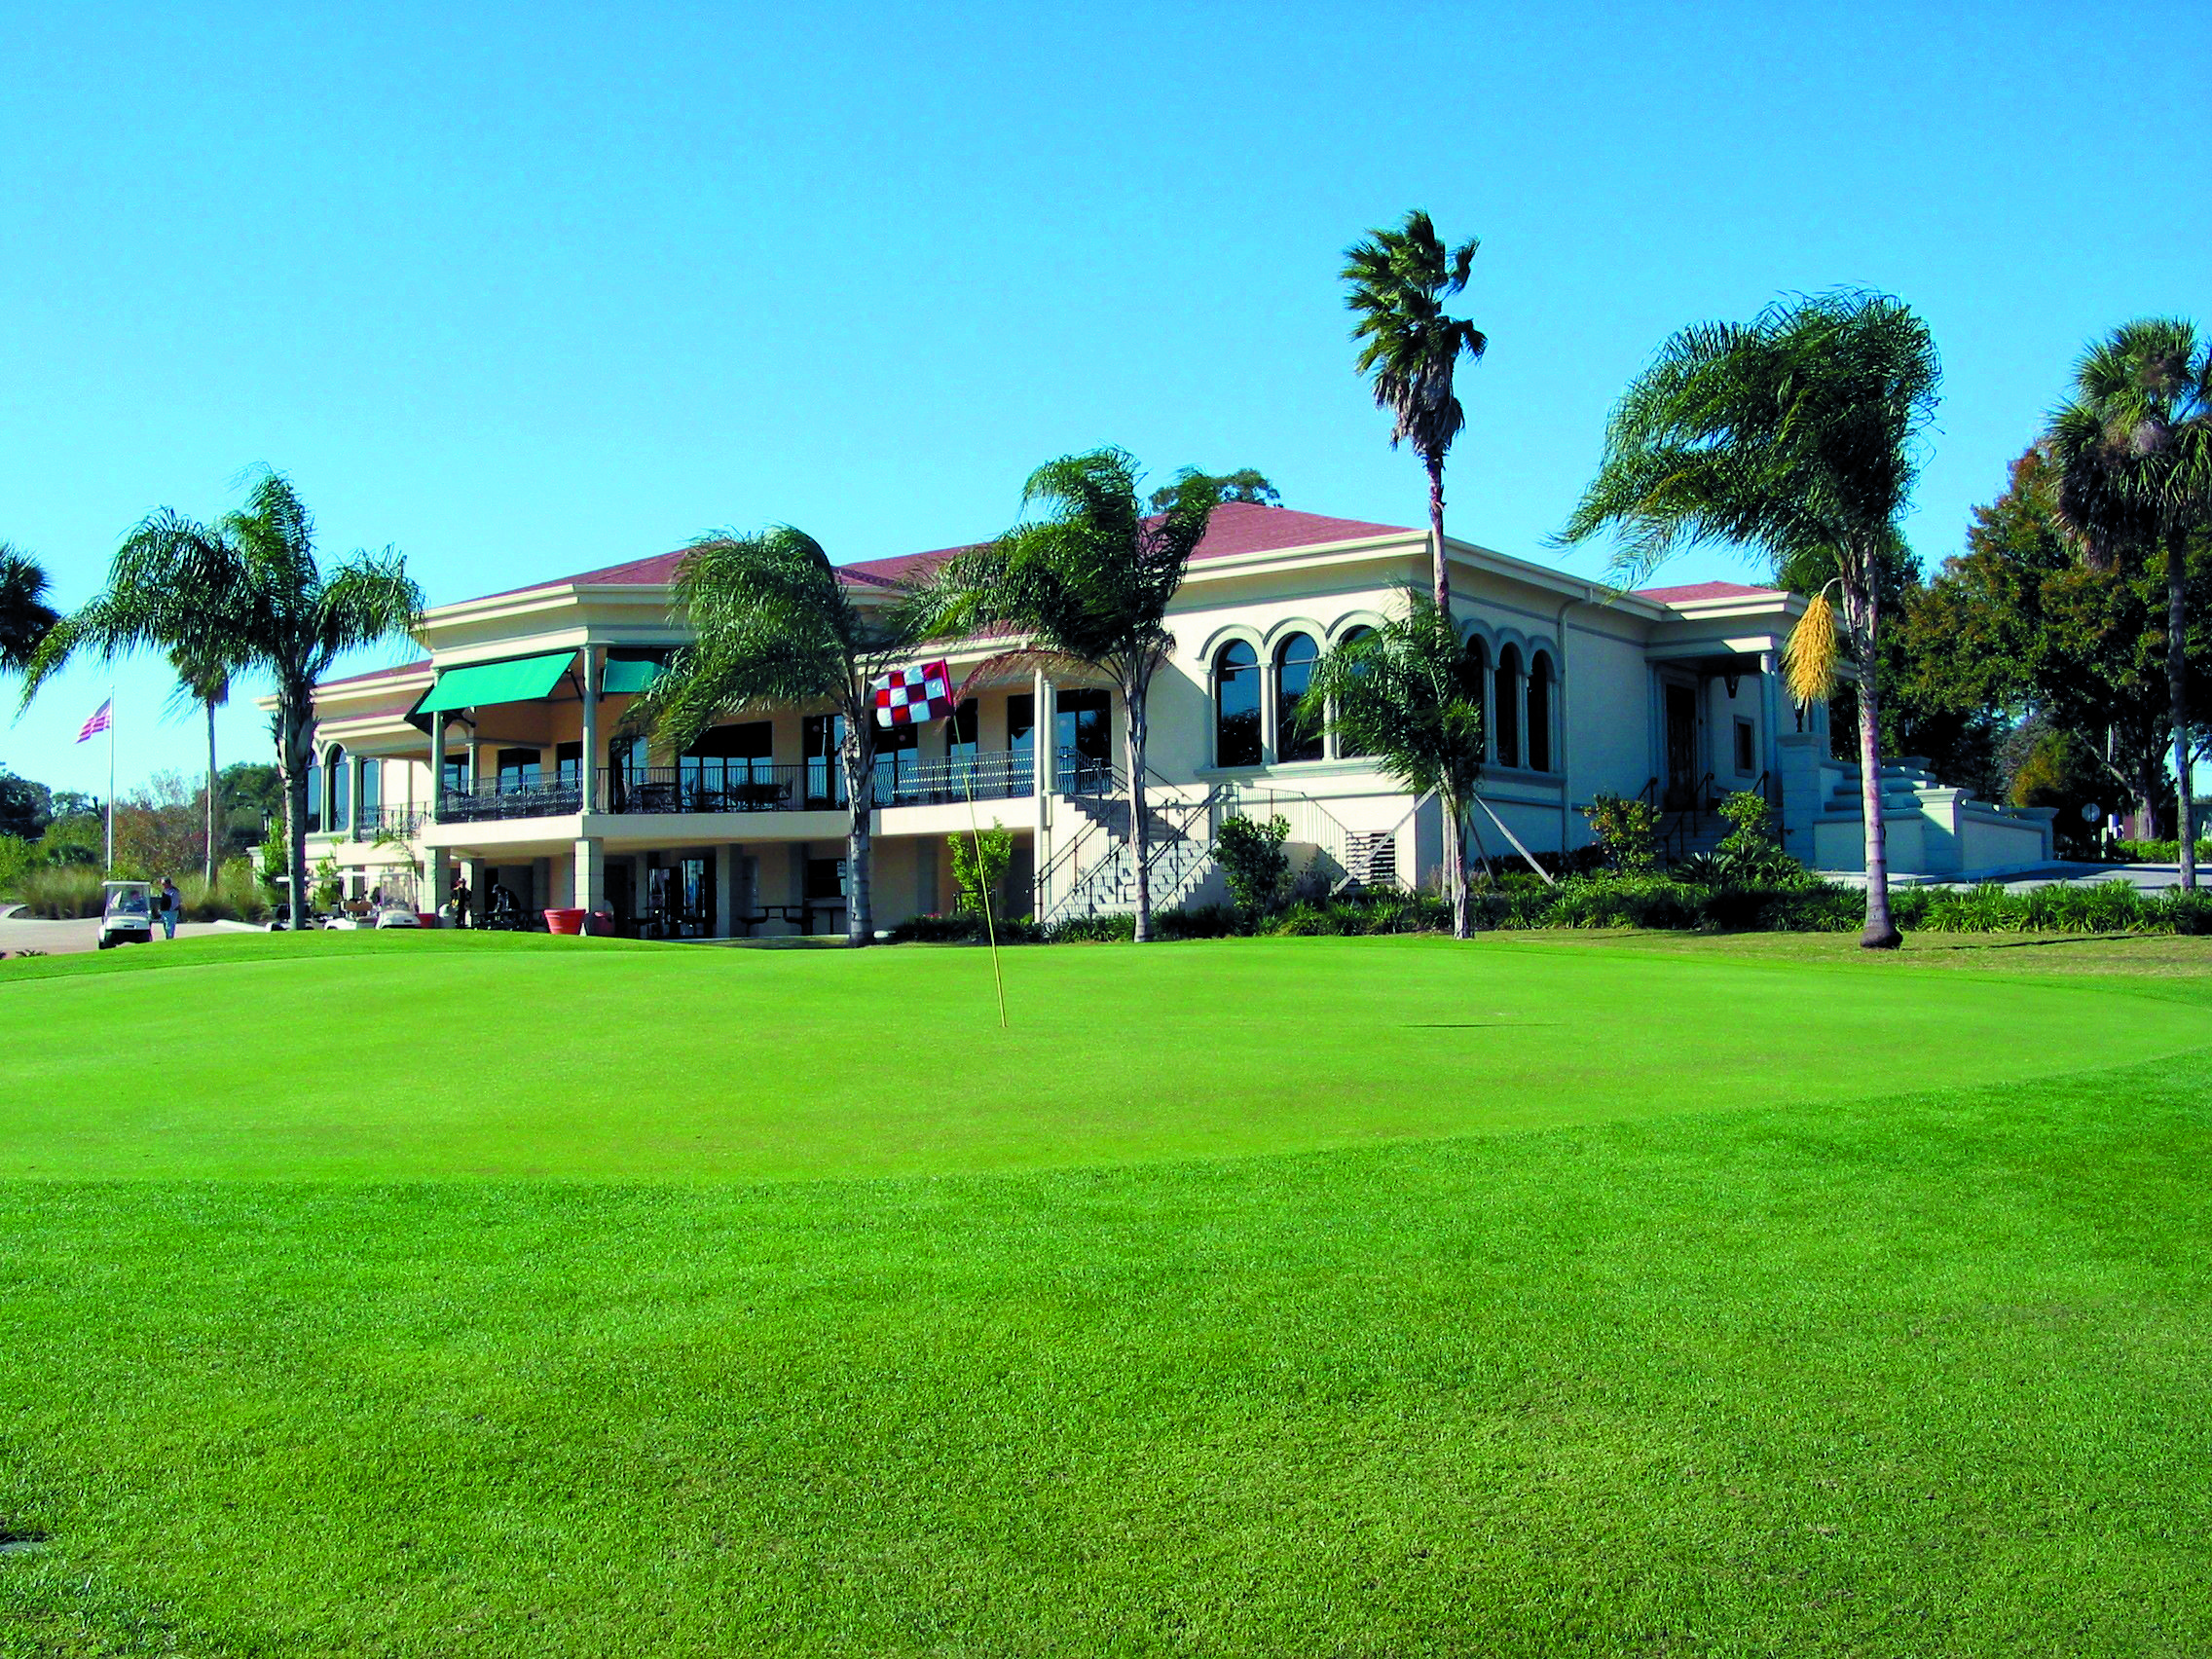 Cleveland Heights Golf Course Lakeland Polk County Central Florida Golf Courses Cleveland Heights Central Florida